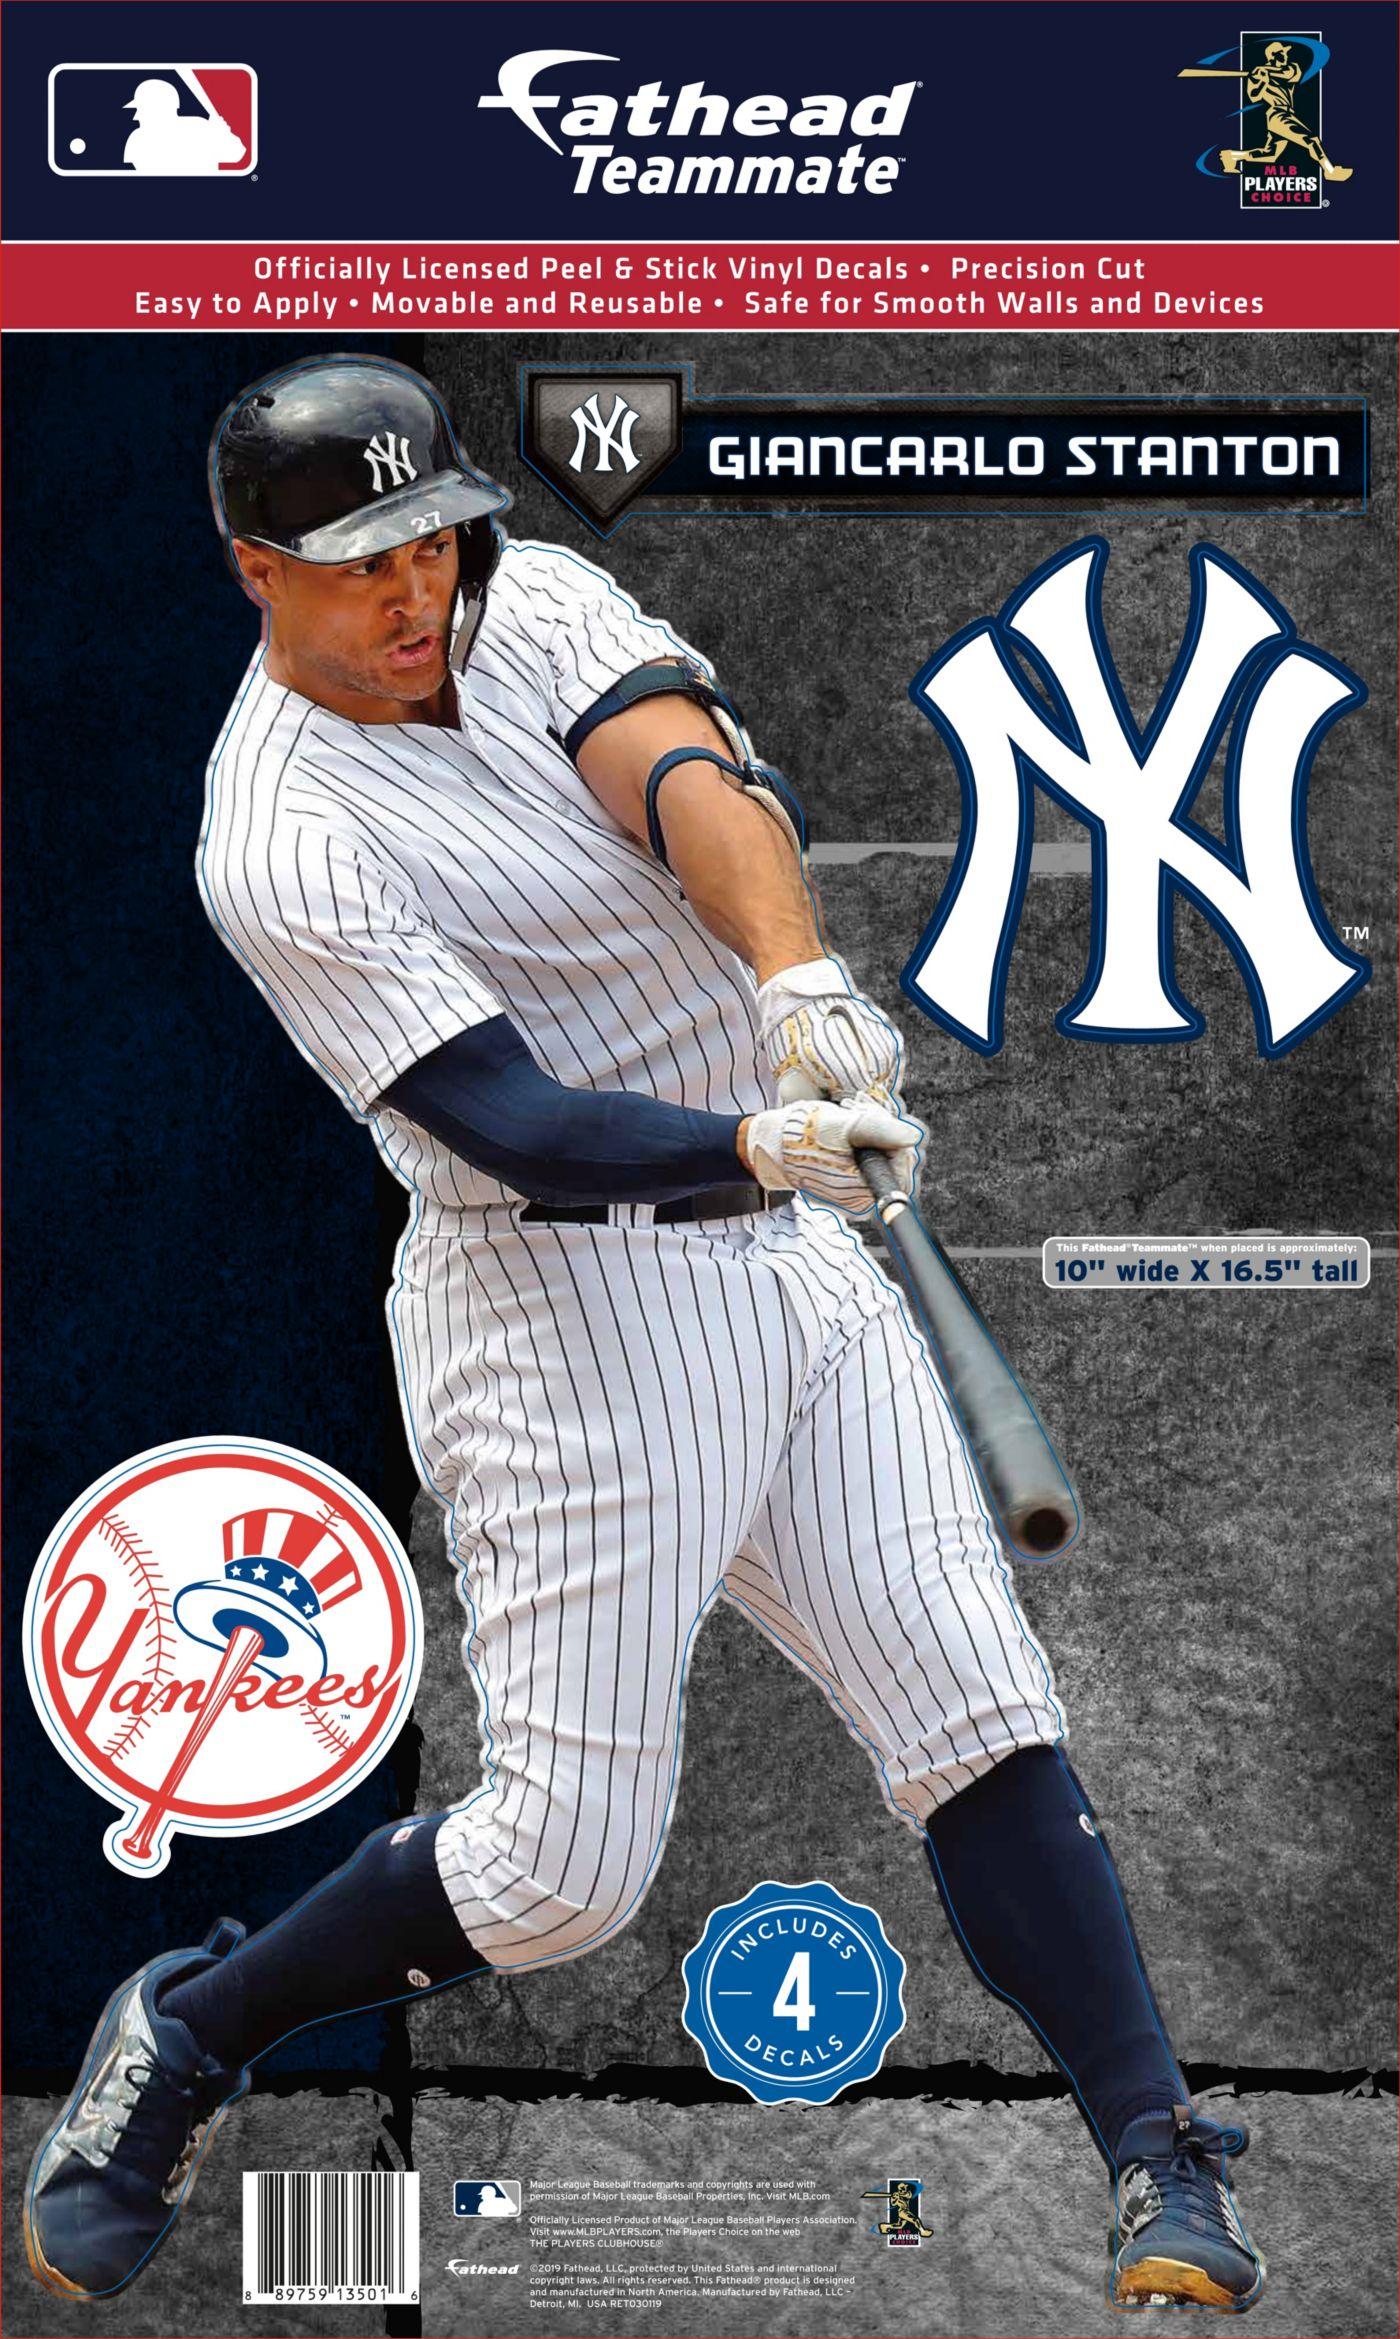 Fathead New York Yankees Giancarlo Stanton Teammate Wall Decal